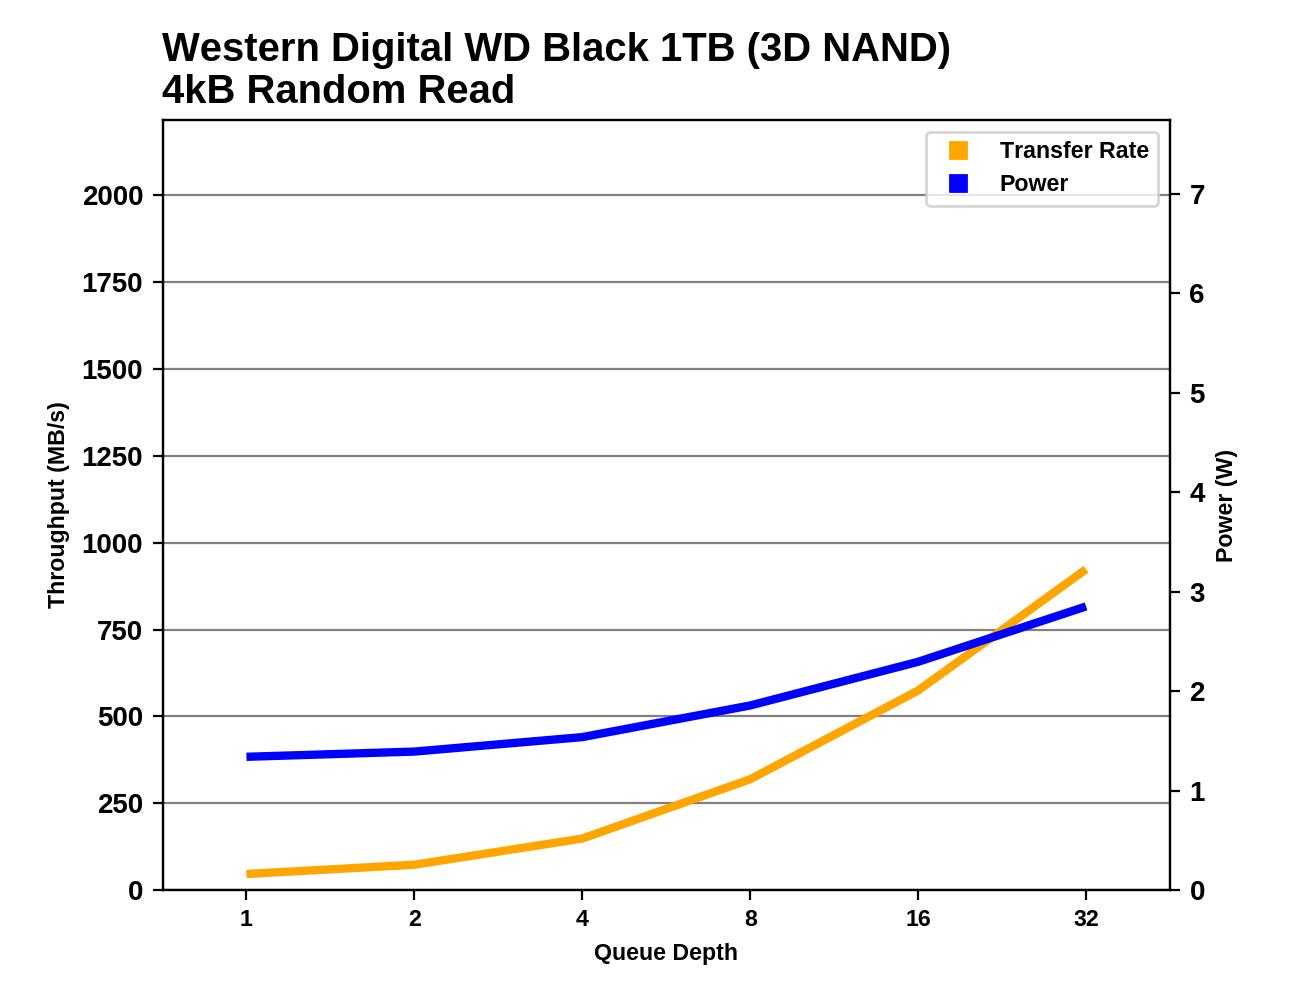 Обзор Western Digital WD Black 3D NAND SSD: EVO встретил равного - 38